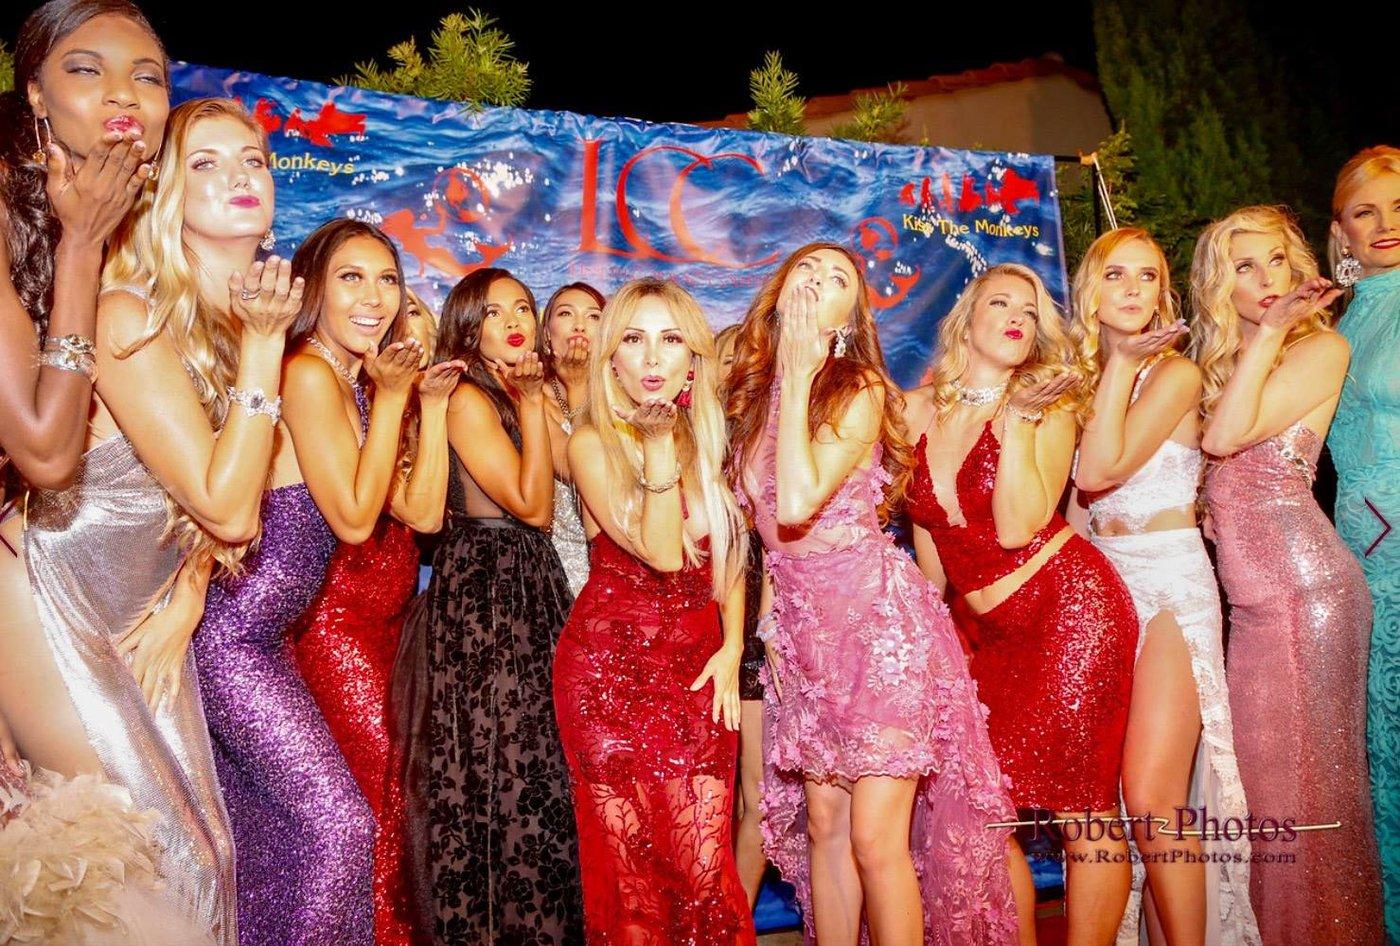 Kiss the Monkeys Celebrity Gala Events Assuaged